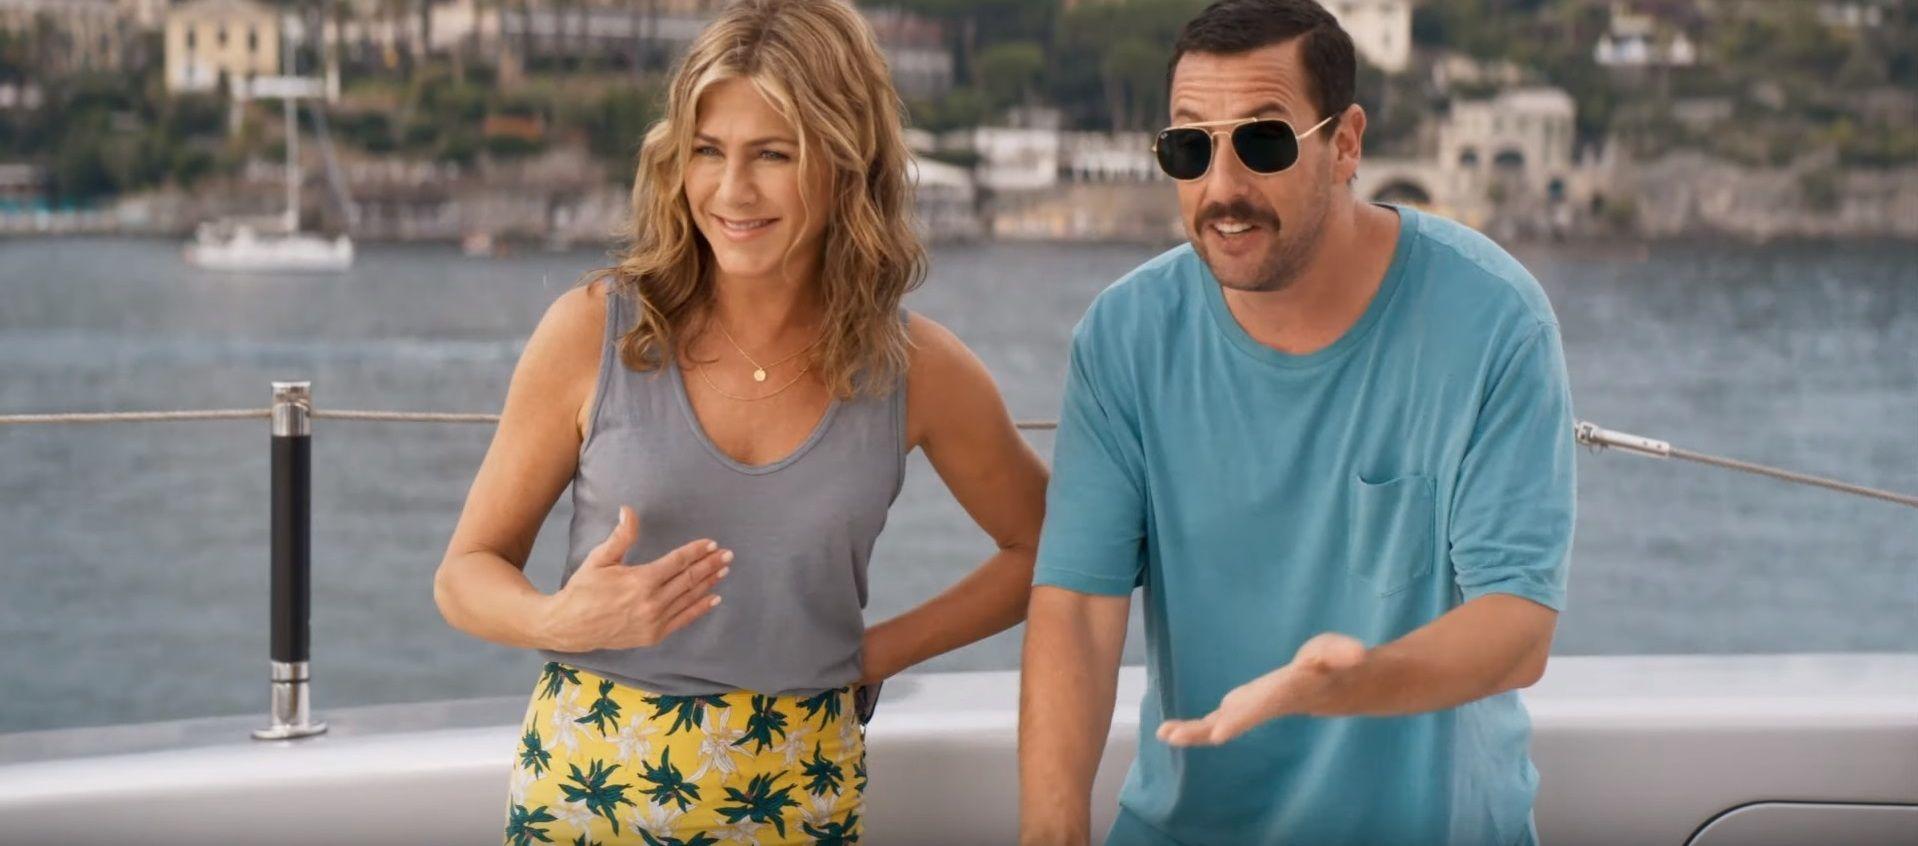 Vuelve la desopilante dupla de Jennifer Aniston y Adam Sandler con Misterio a bordo